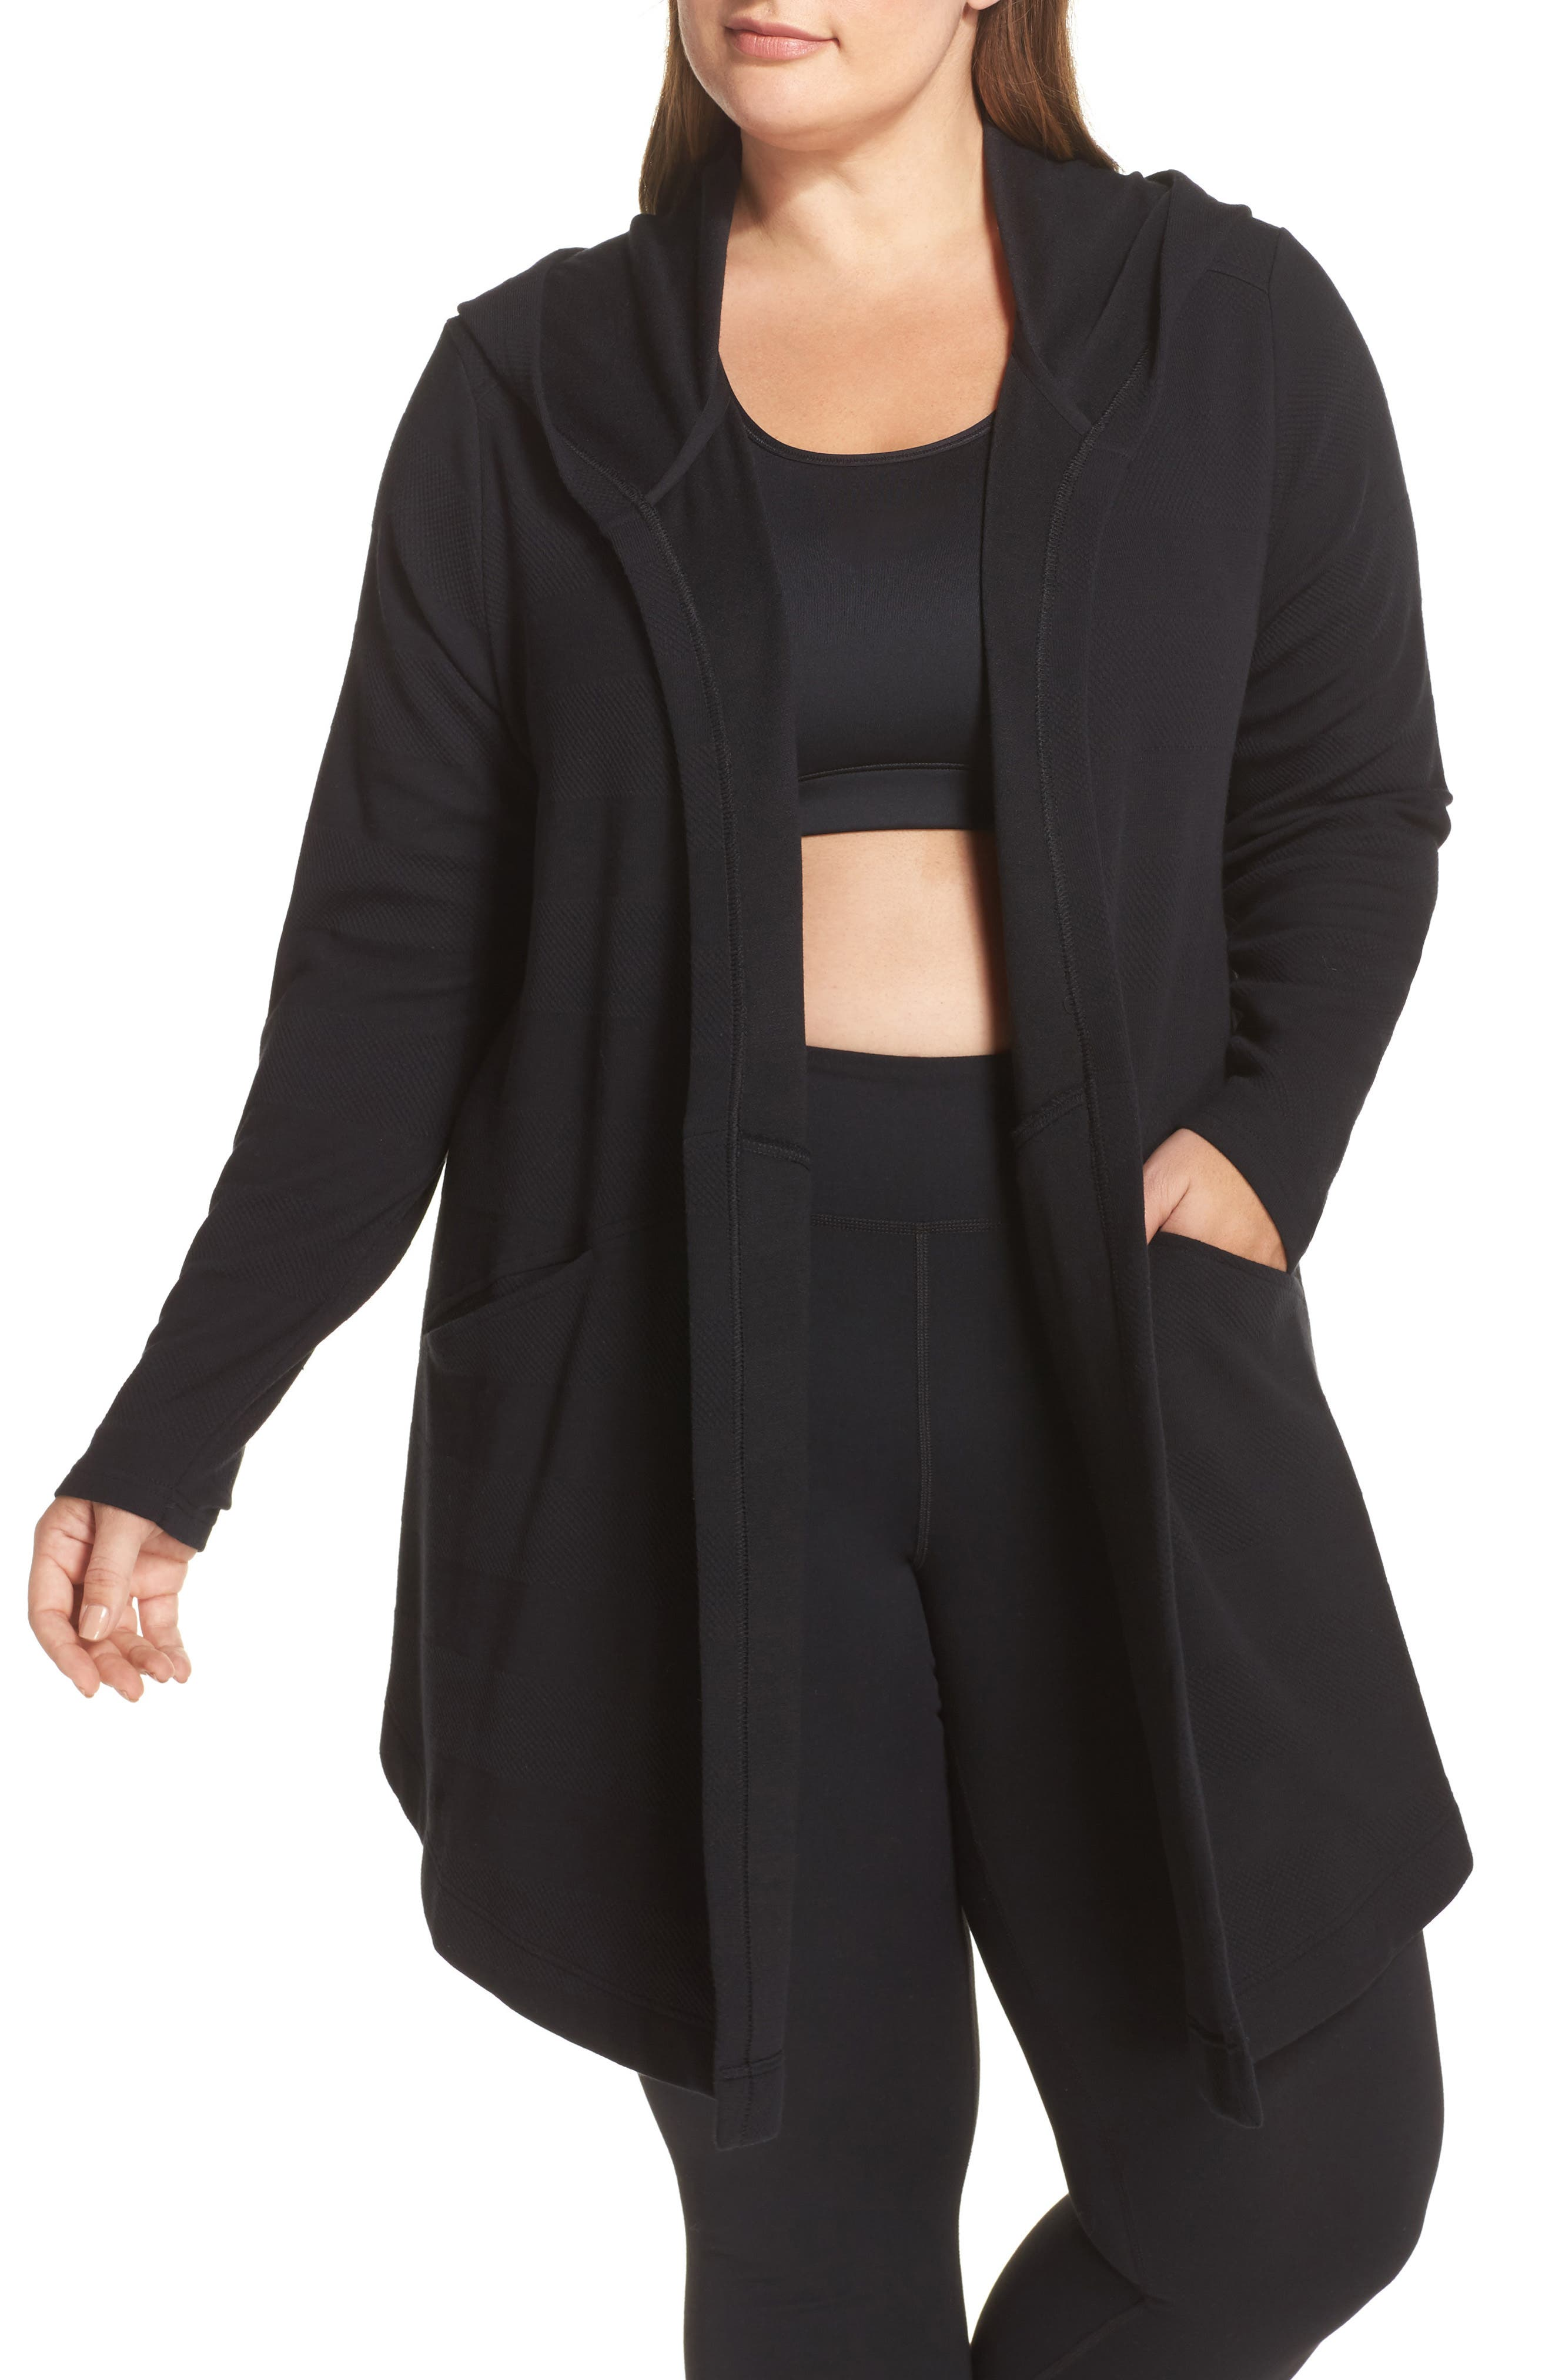 Ria Hooded Cardigan,                         Main,                         color, Black